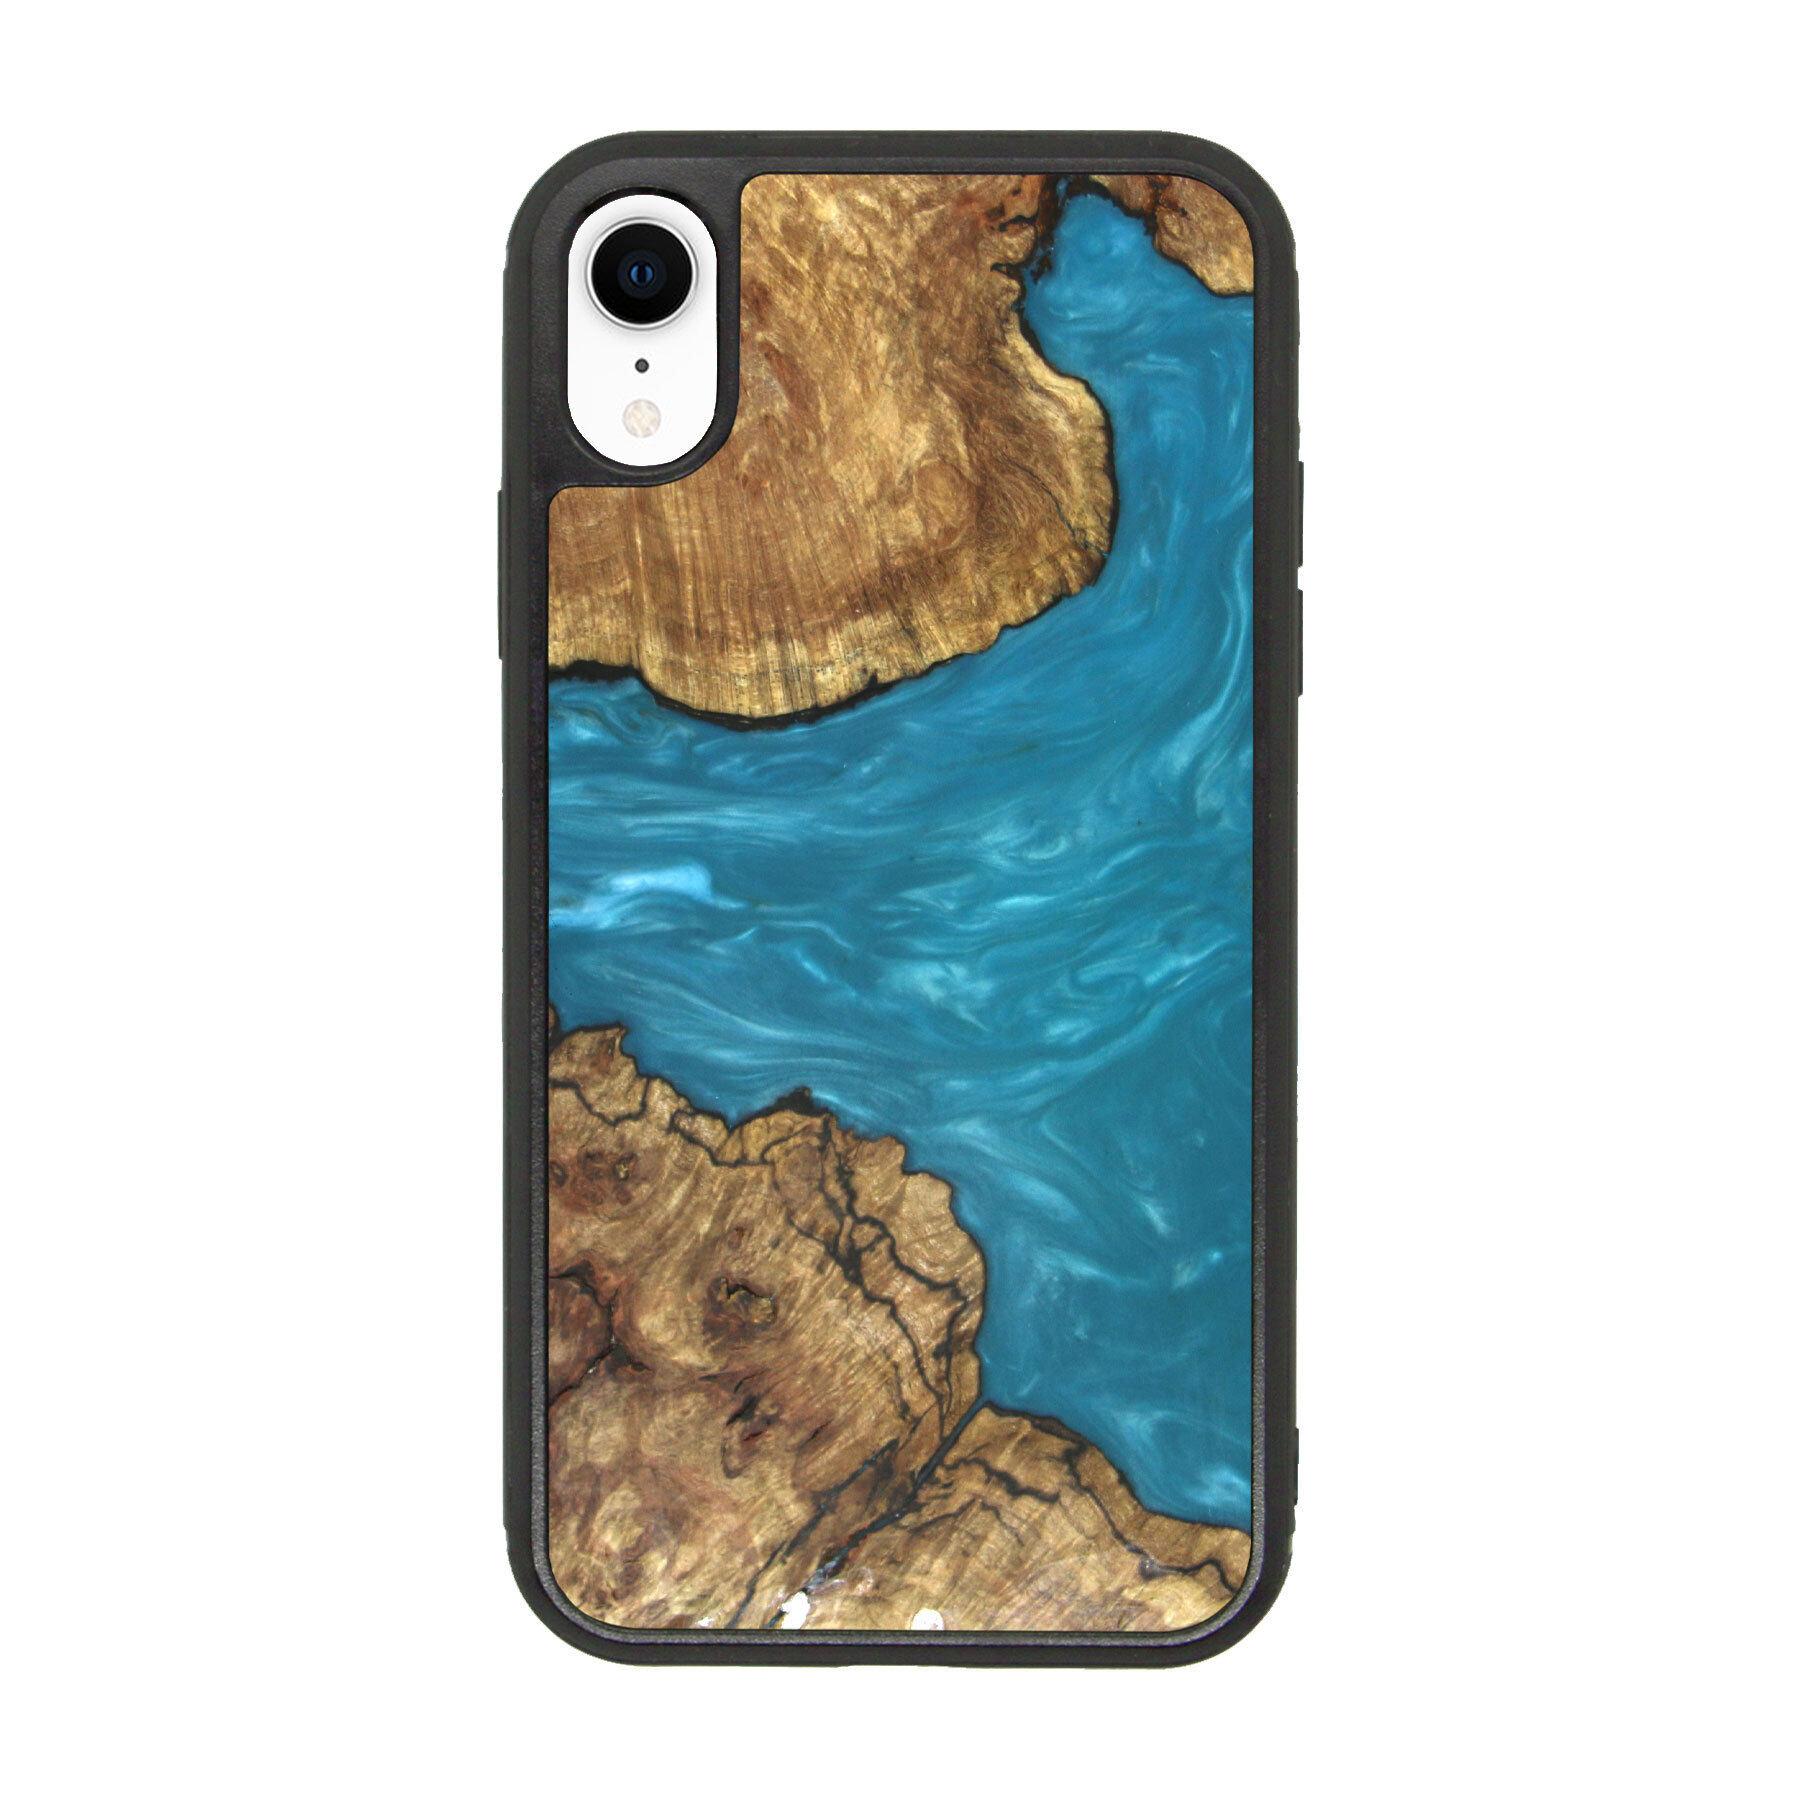 iPhone XR Phone Case